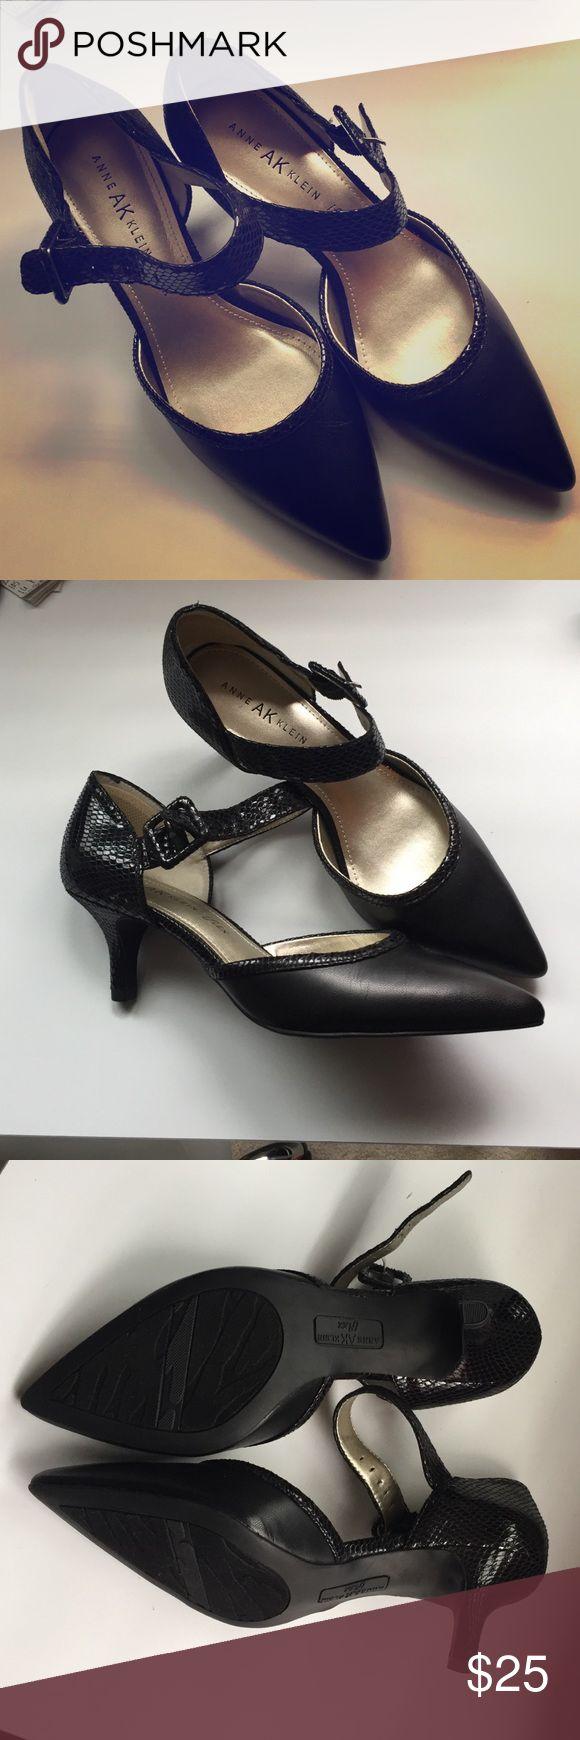 Heels Black heels with strap, Never worn! Anne Klein Shoes Heels